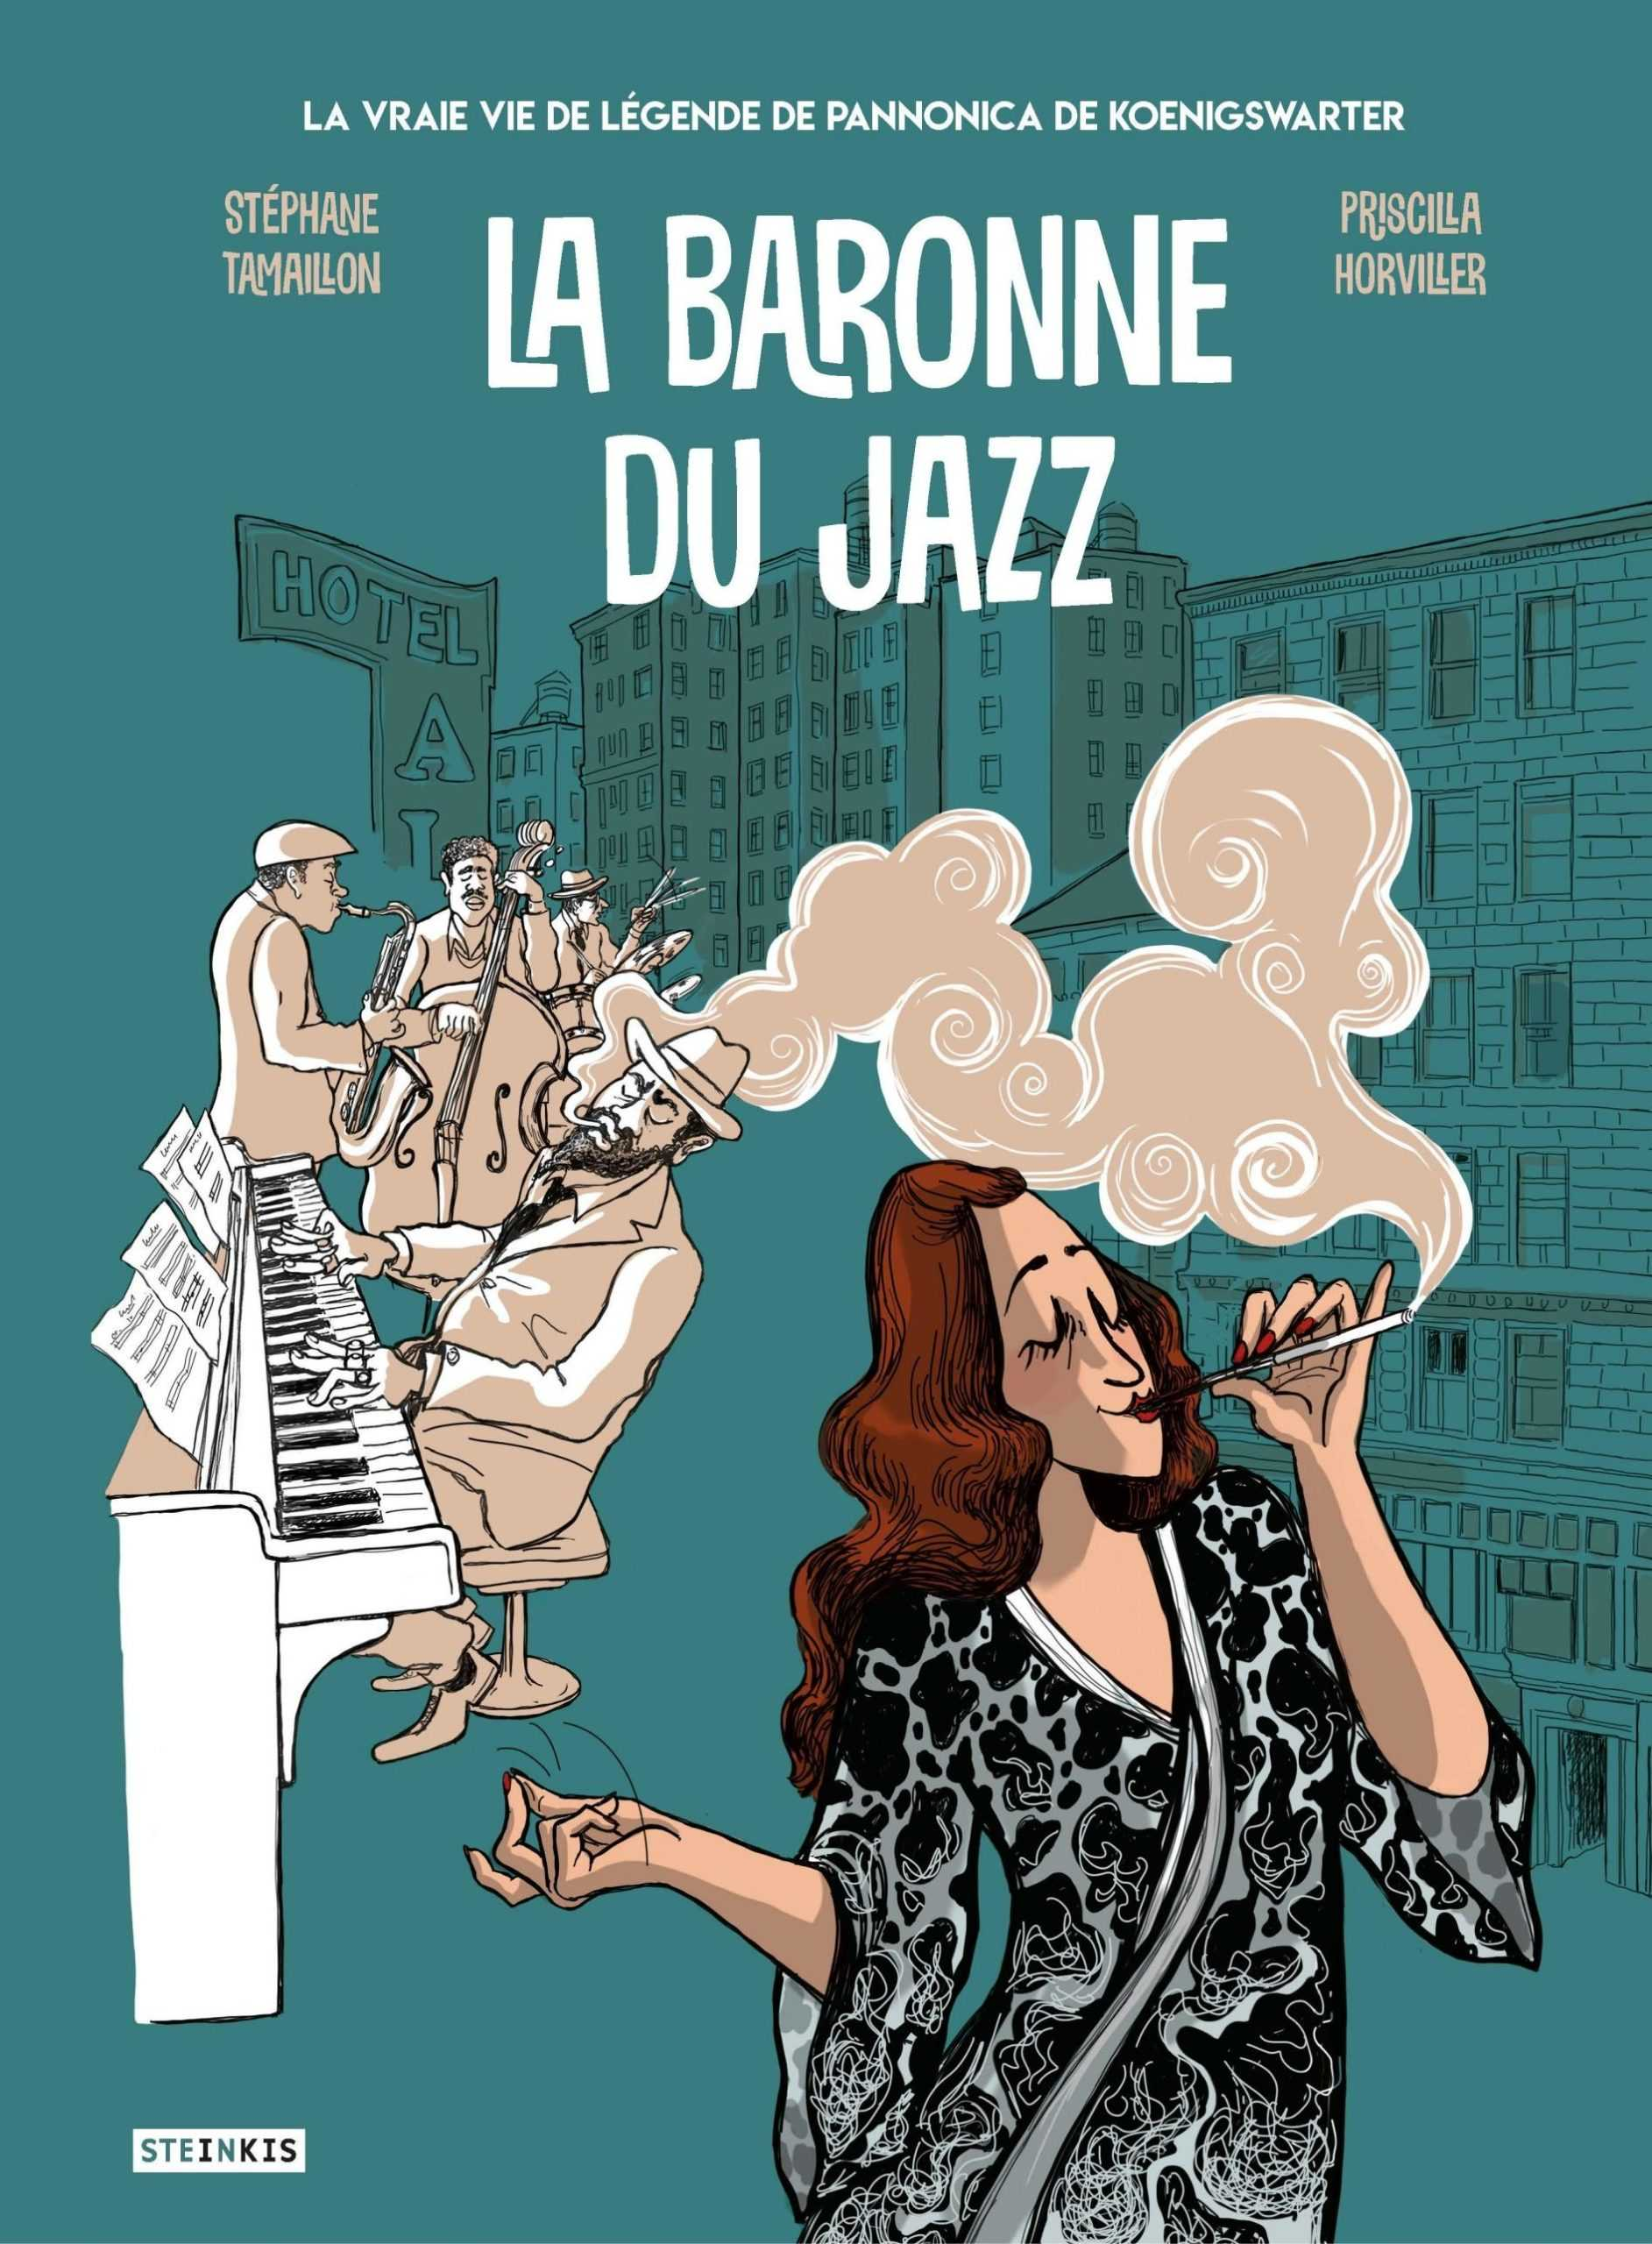 La Baronne du jazz, Pannonica la rebelle